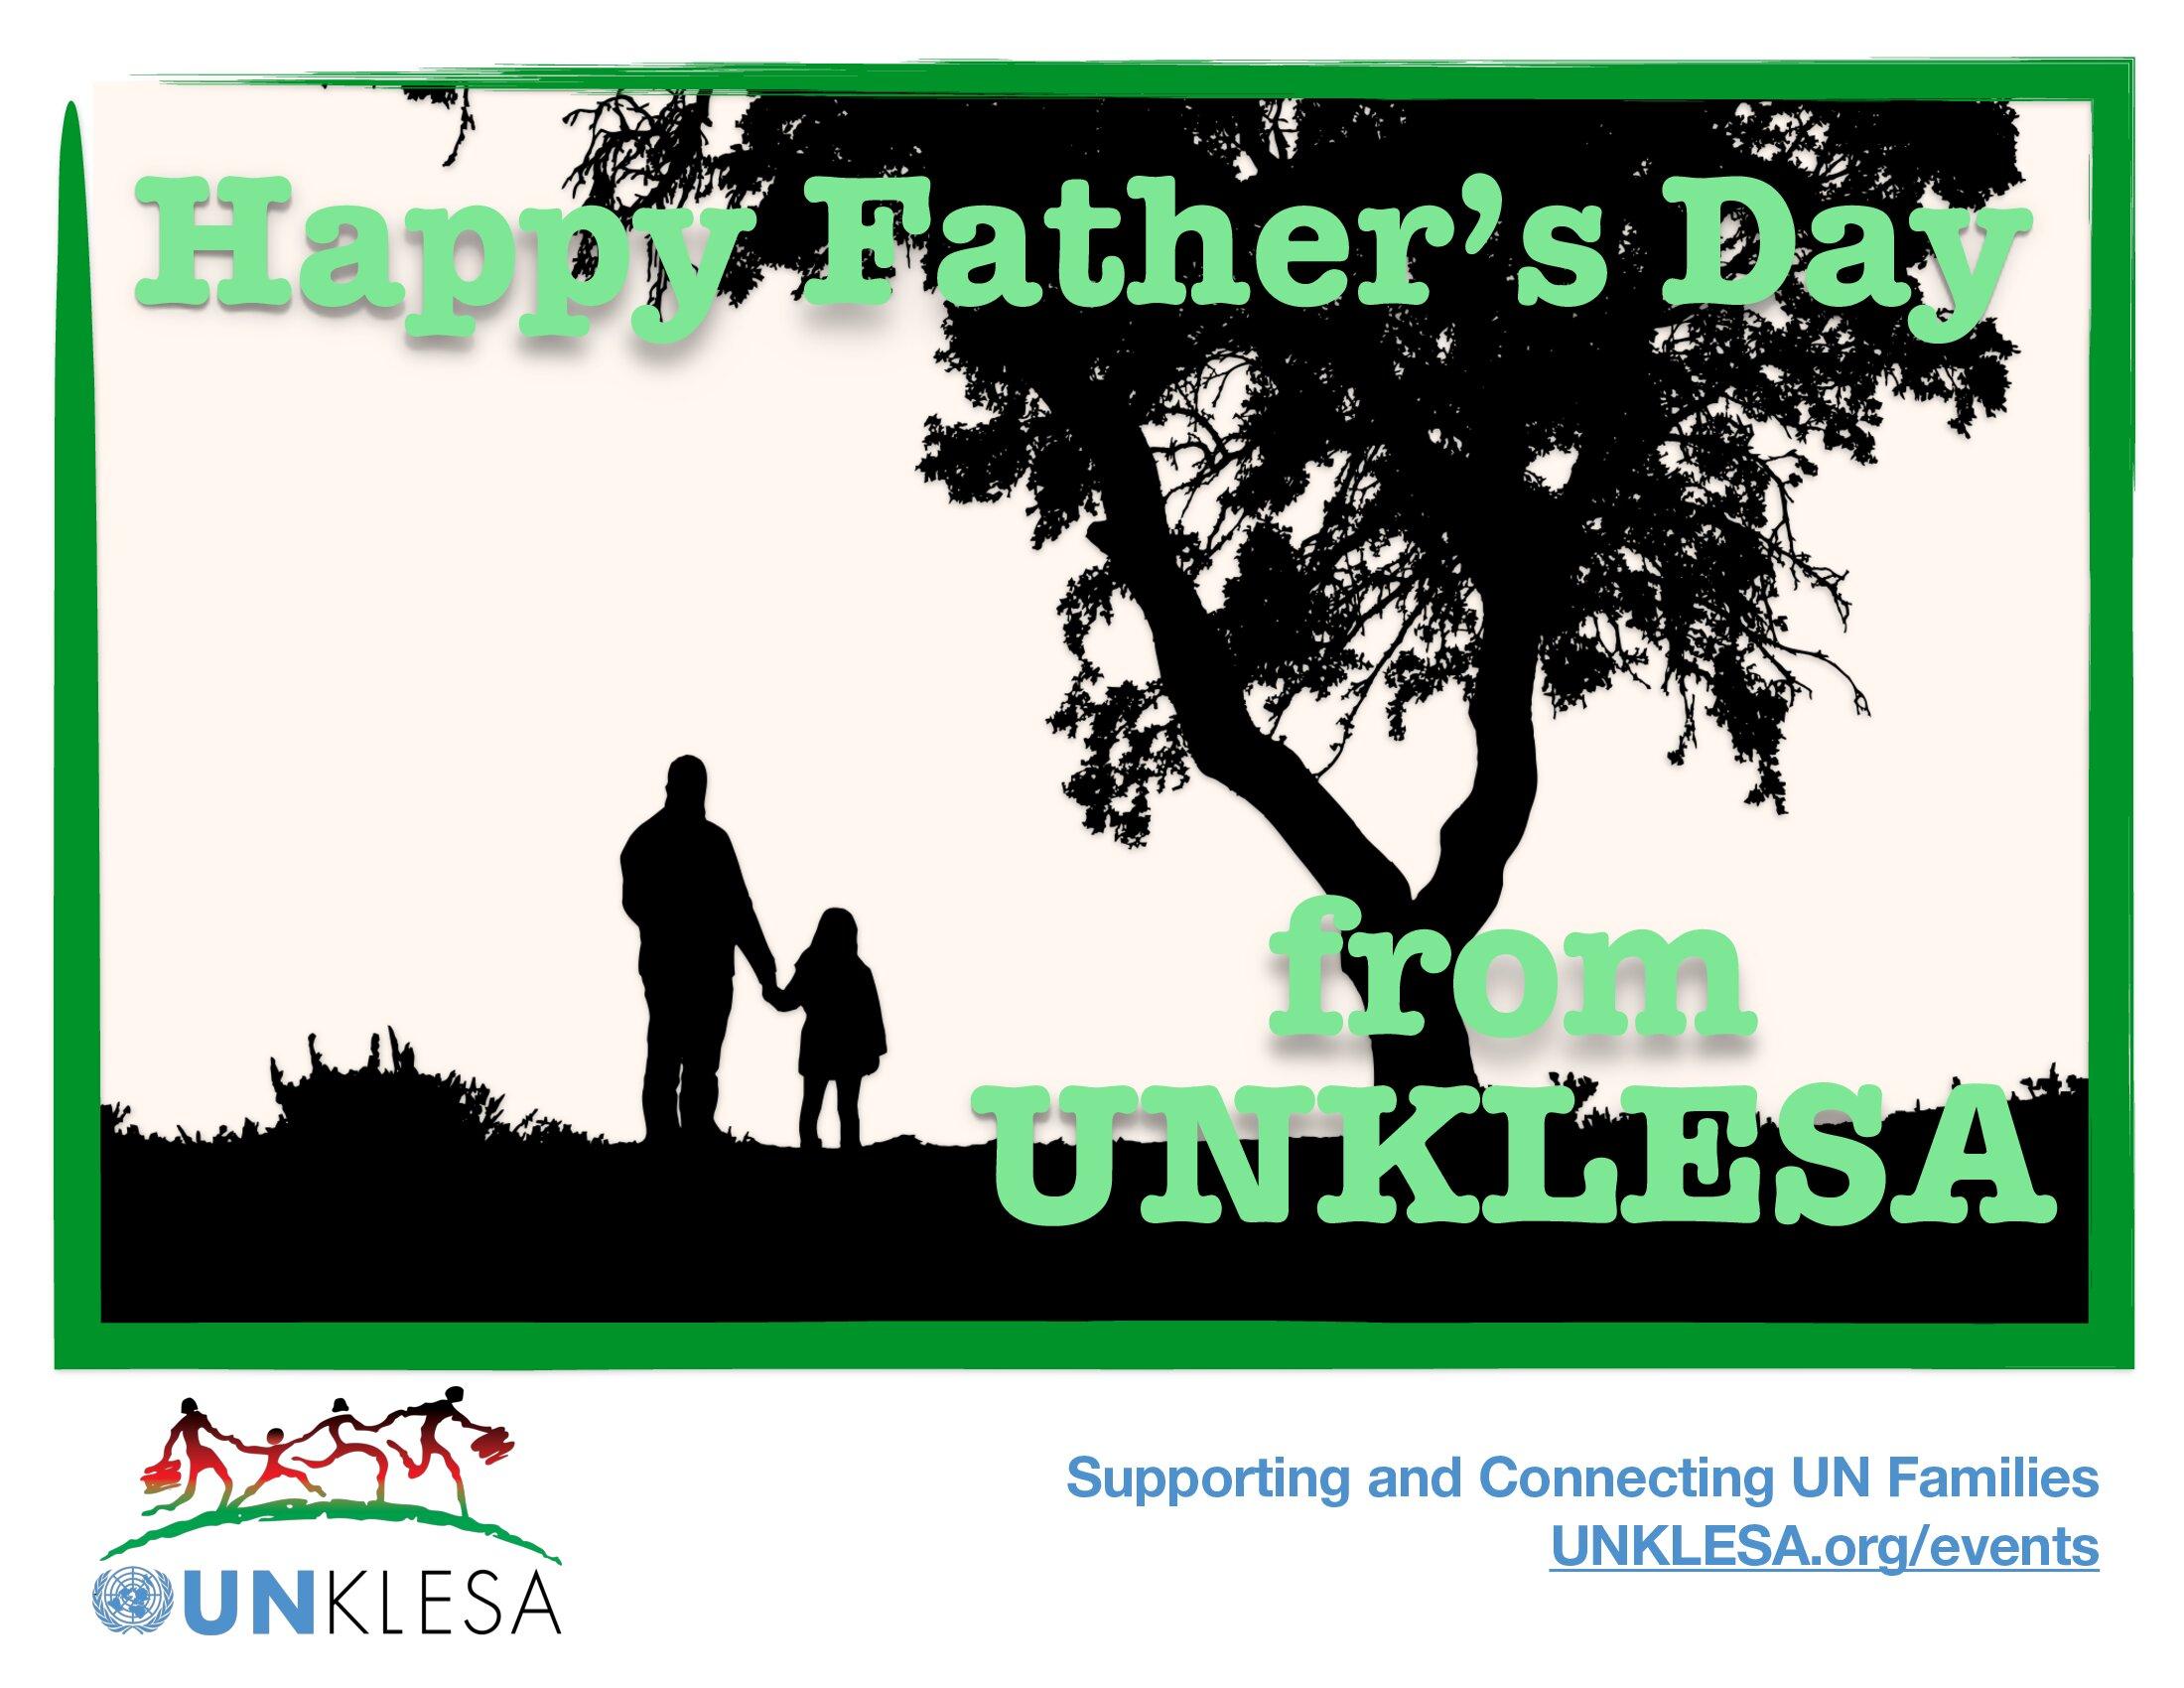 UNKLESA_FathersDay.jpg